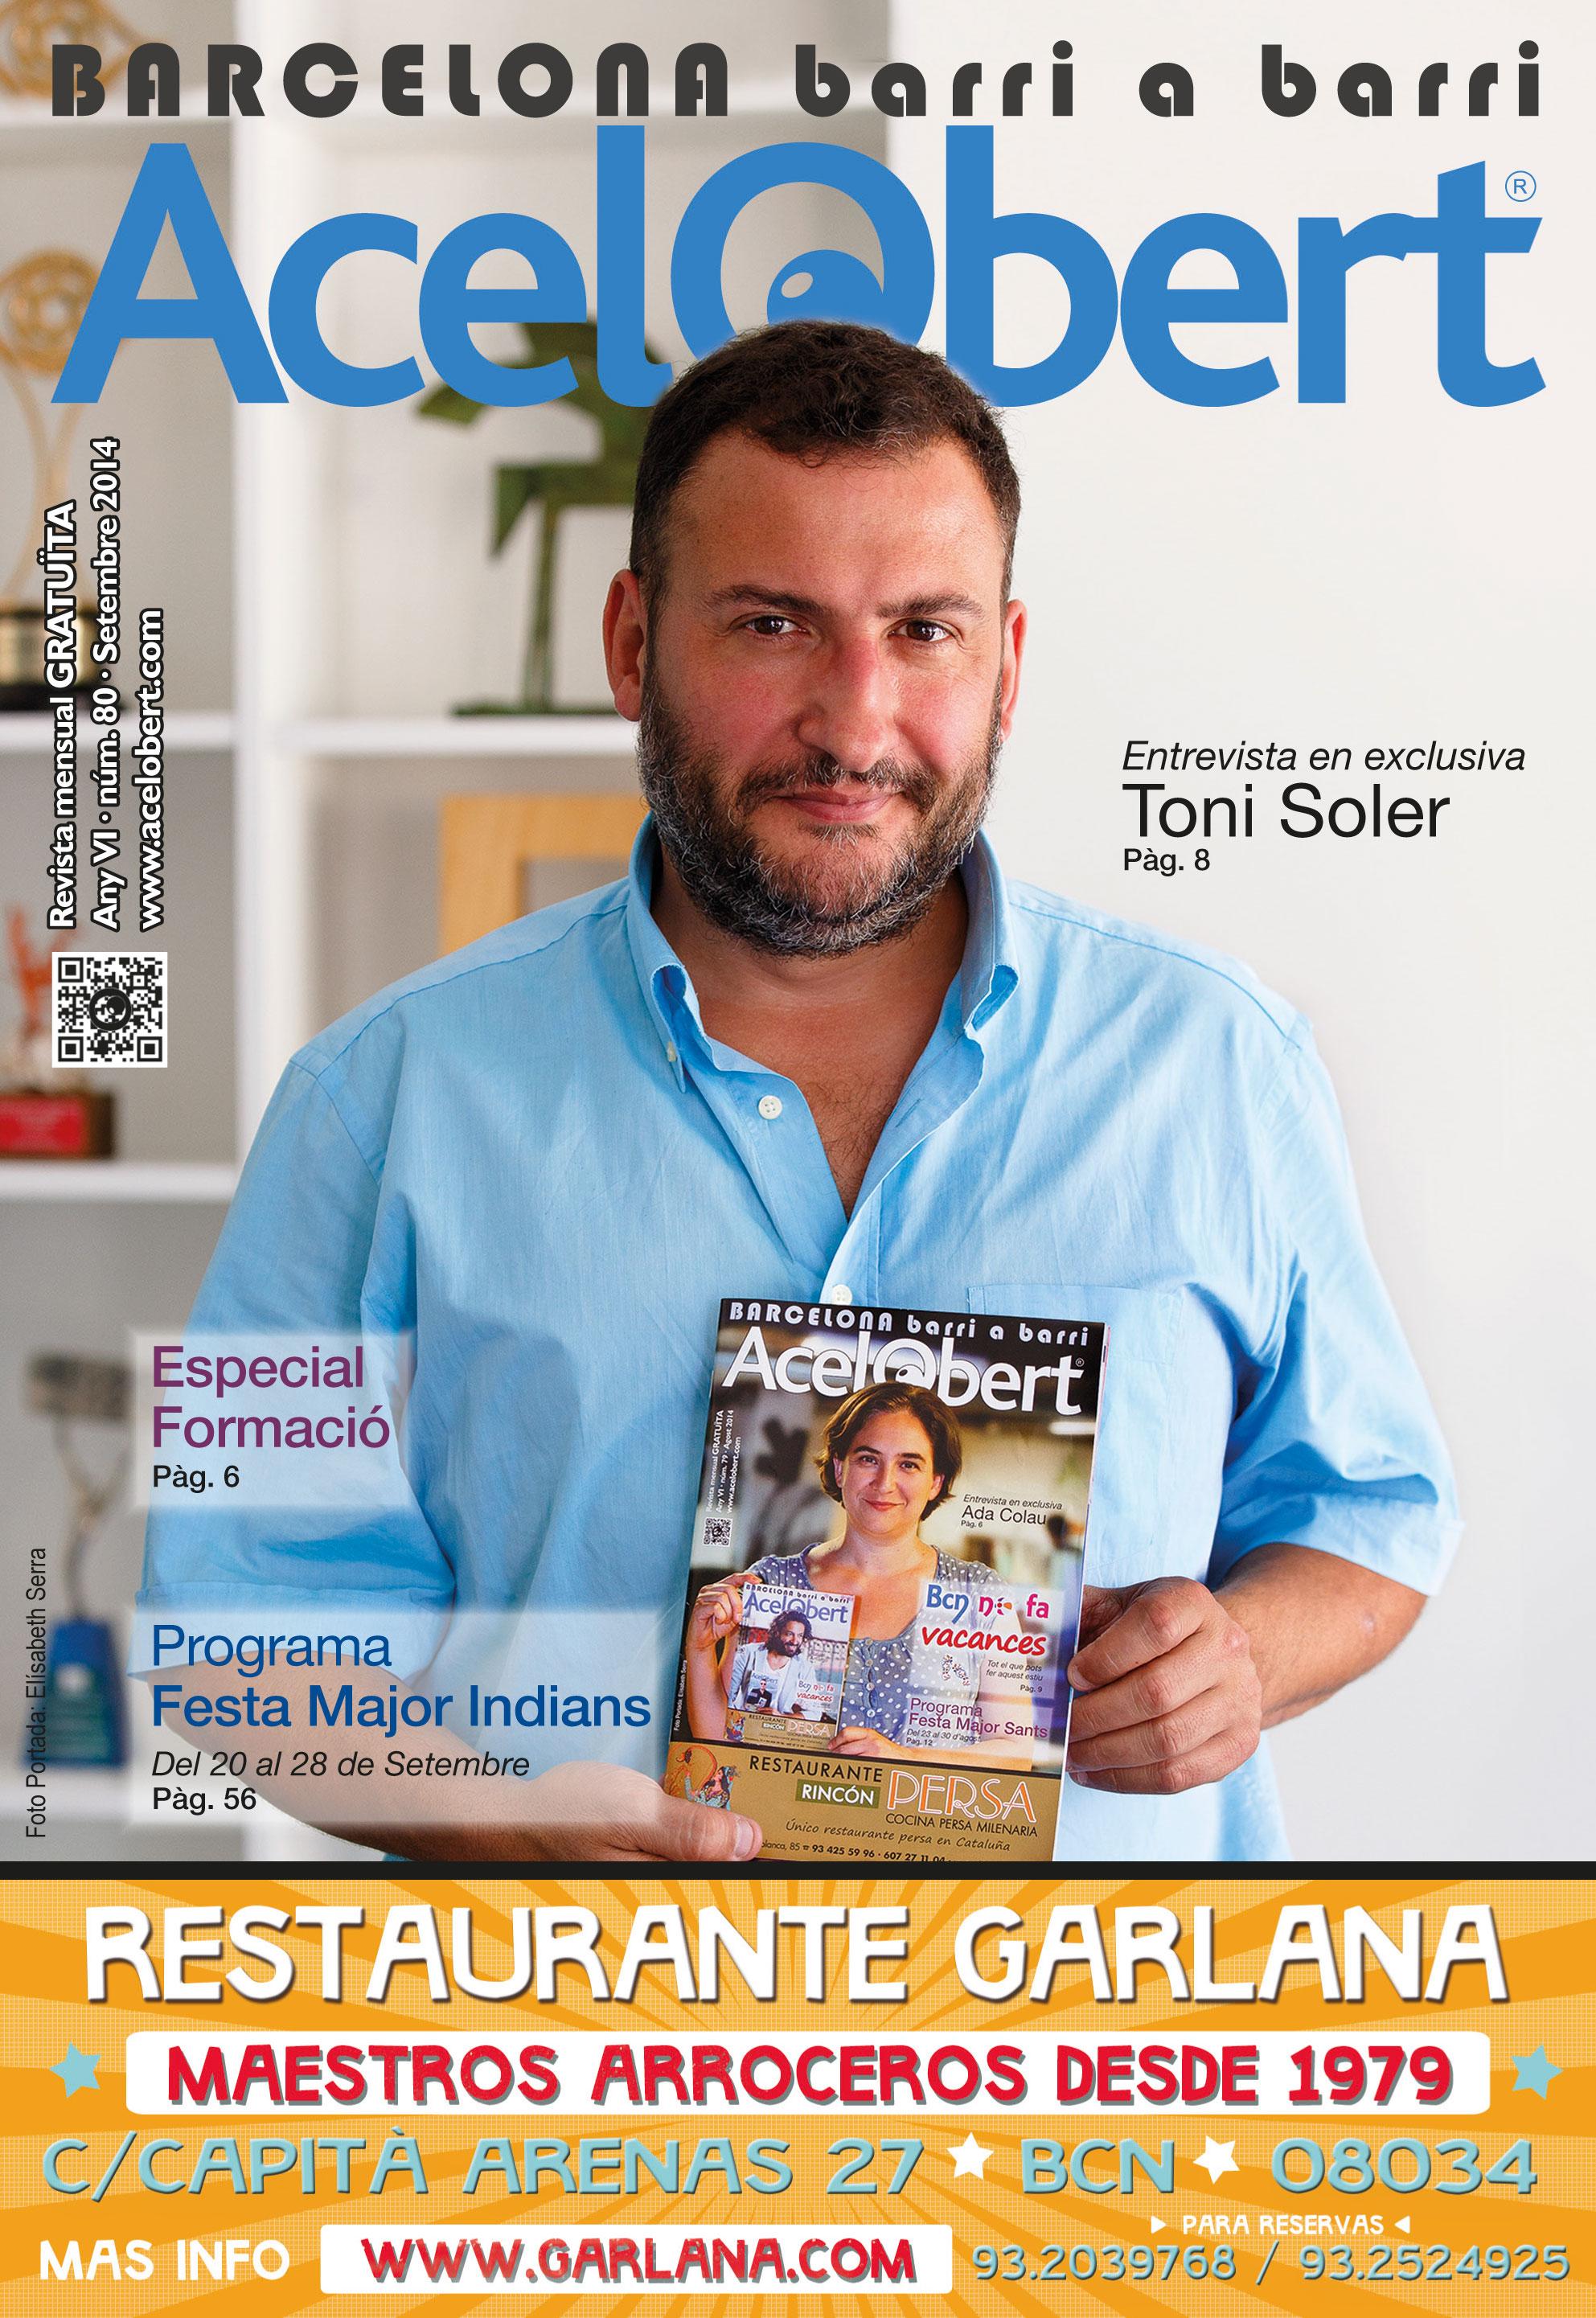 Acelobert Barcelona nº80 Setembre 2014